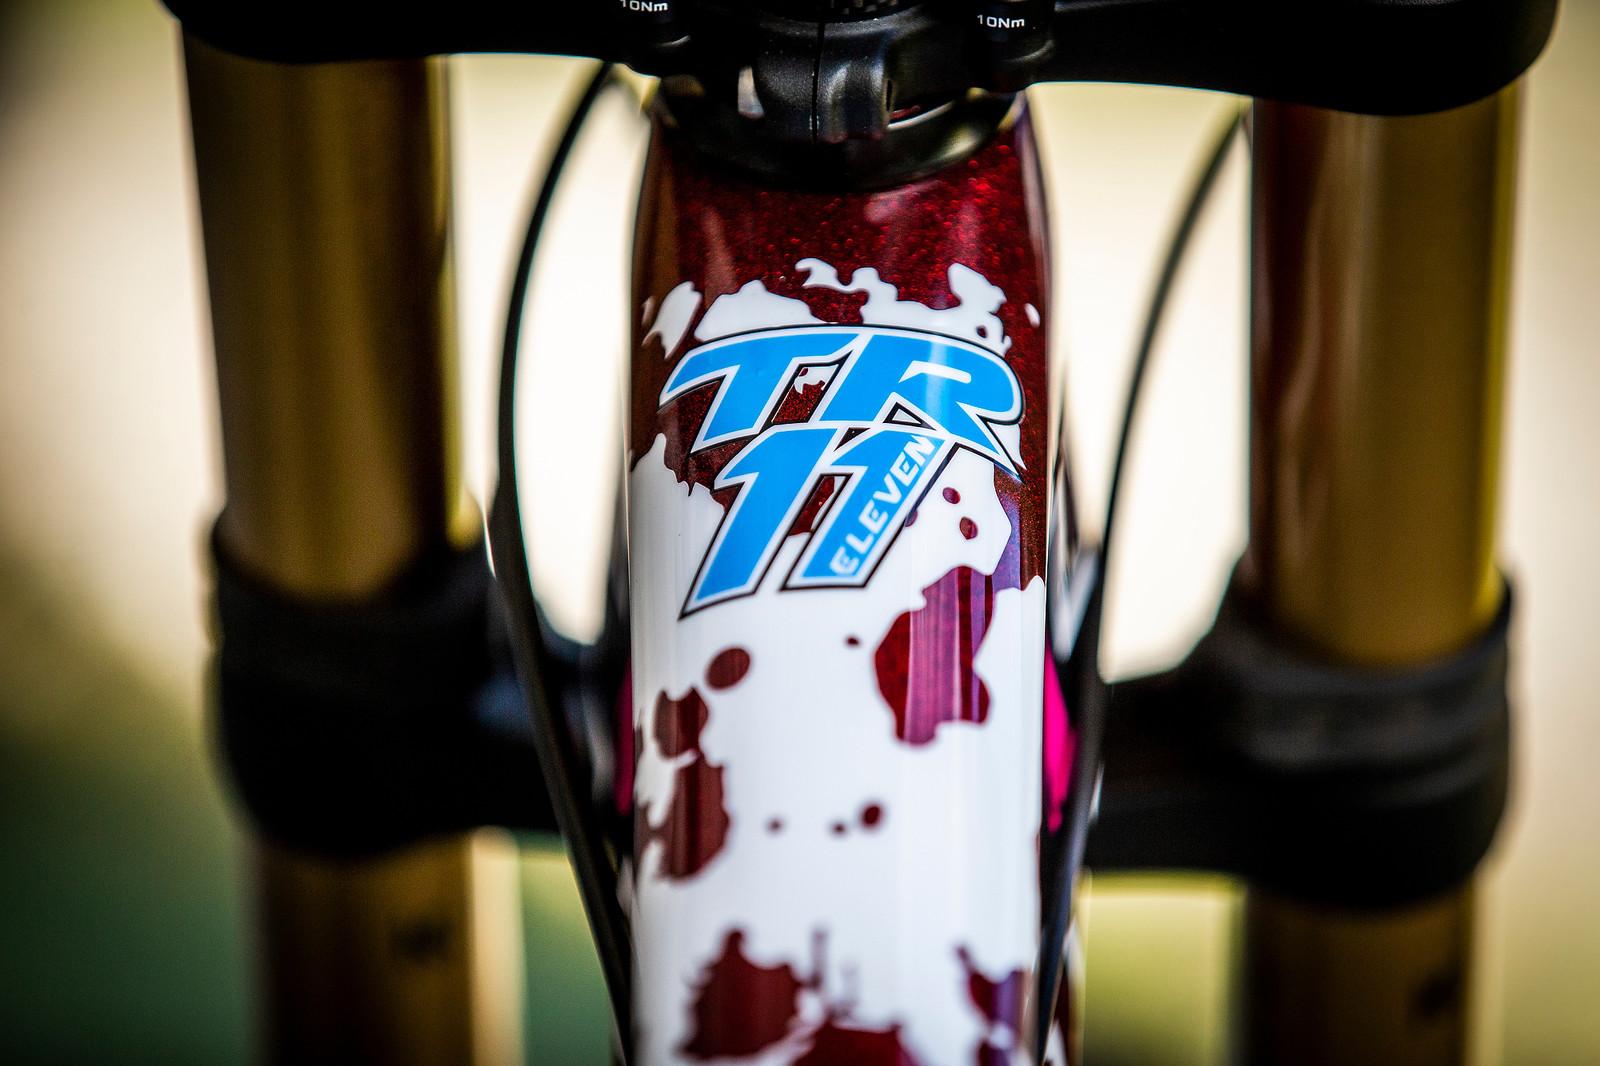 Splat! - WORLD CHAMPS BIKE - Tahnee Seagrave's Transition TR11 - Mountain Biking Pictures - Vital MTB